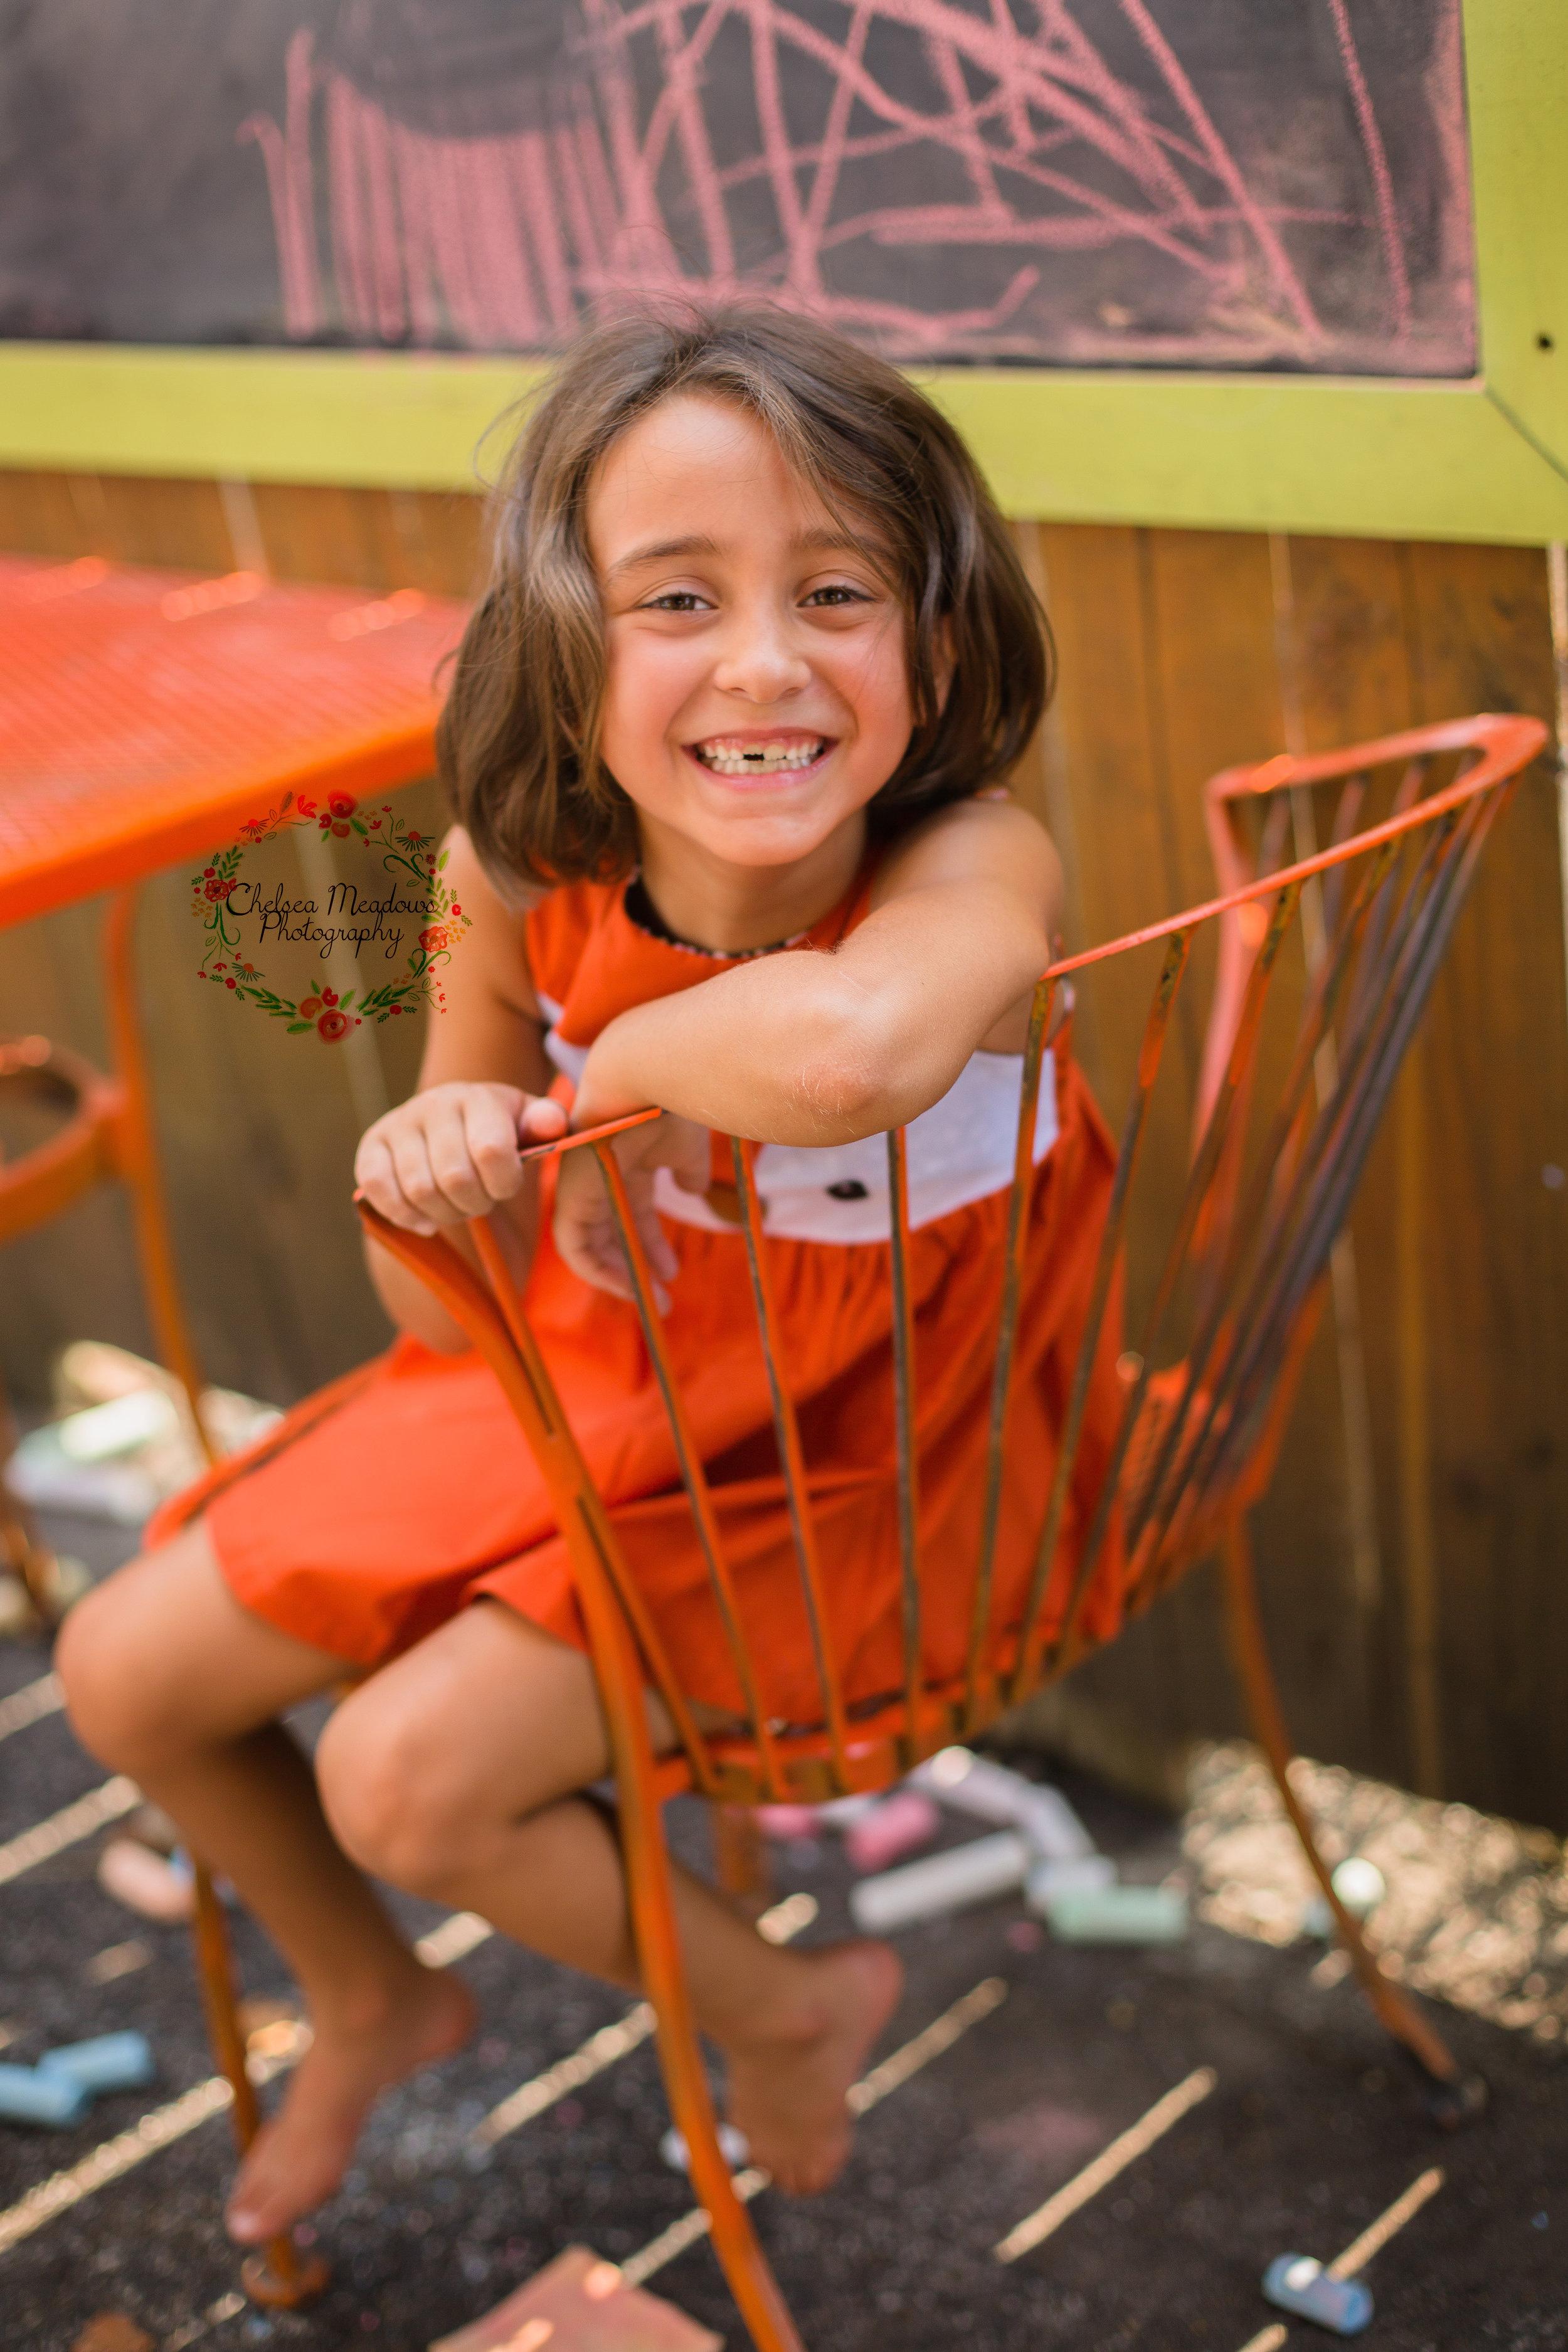 Izzy Family Photoshoot - Nashville Family Photographer - Chelsea Meadows Photography (18).jpg